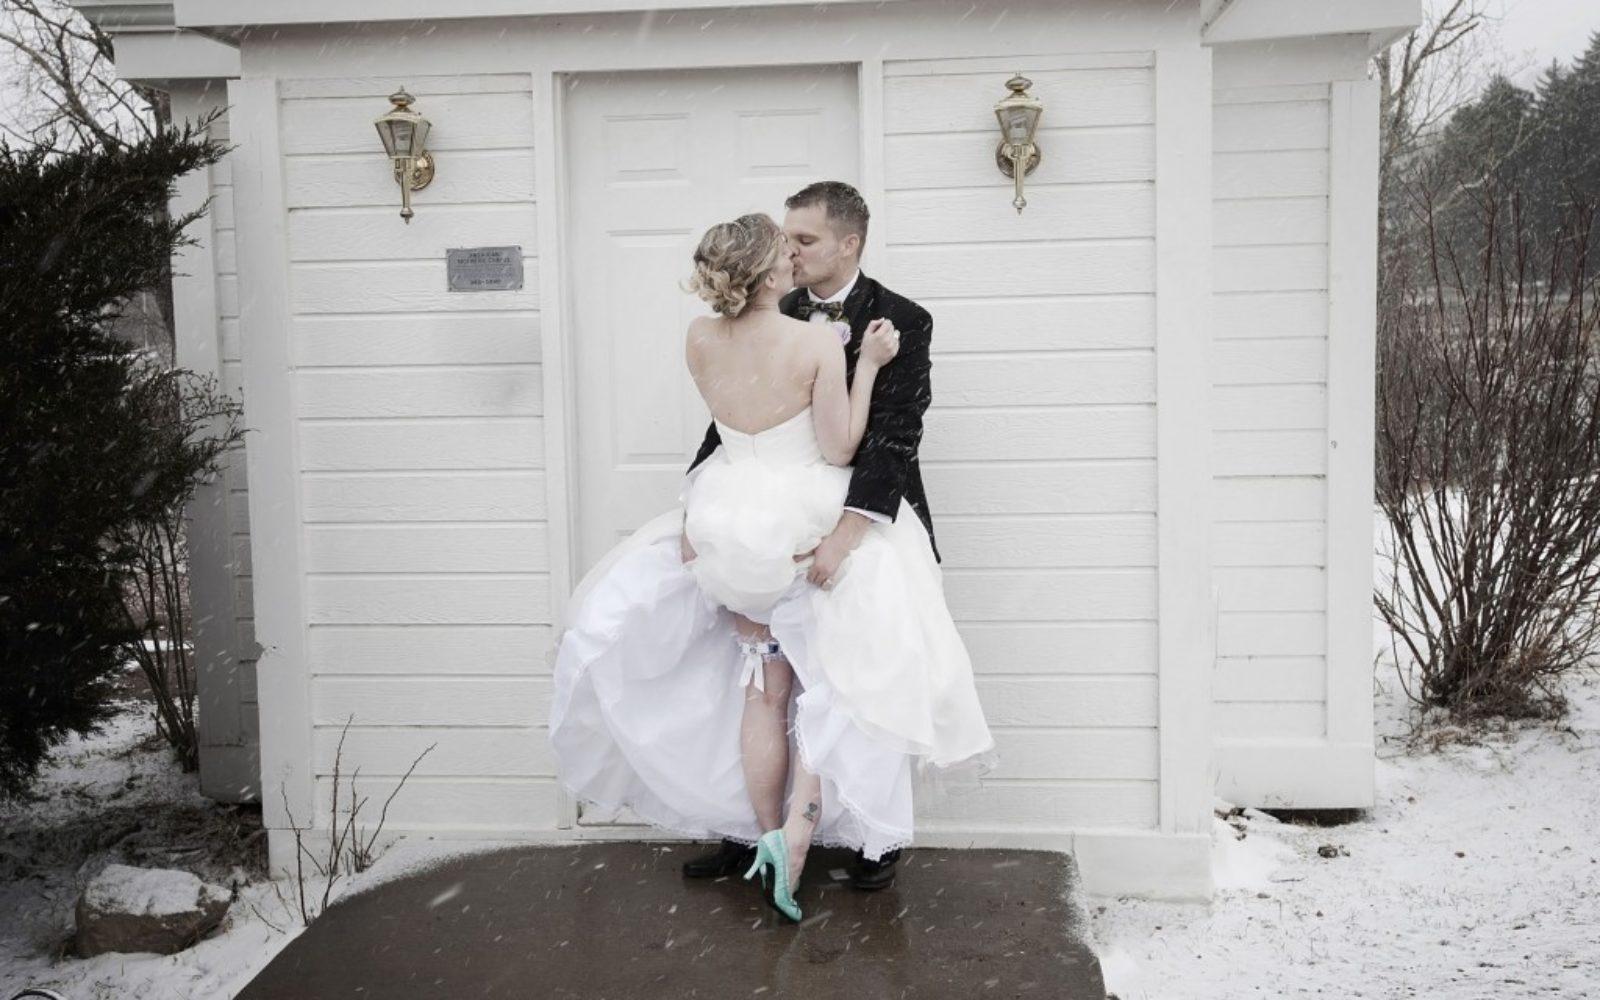 wedding-bride-groom-1024x640